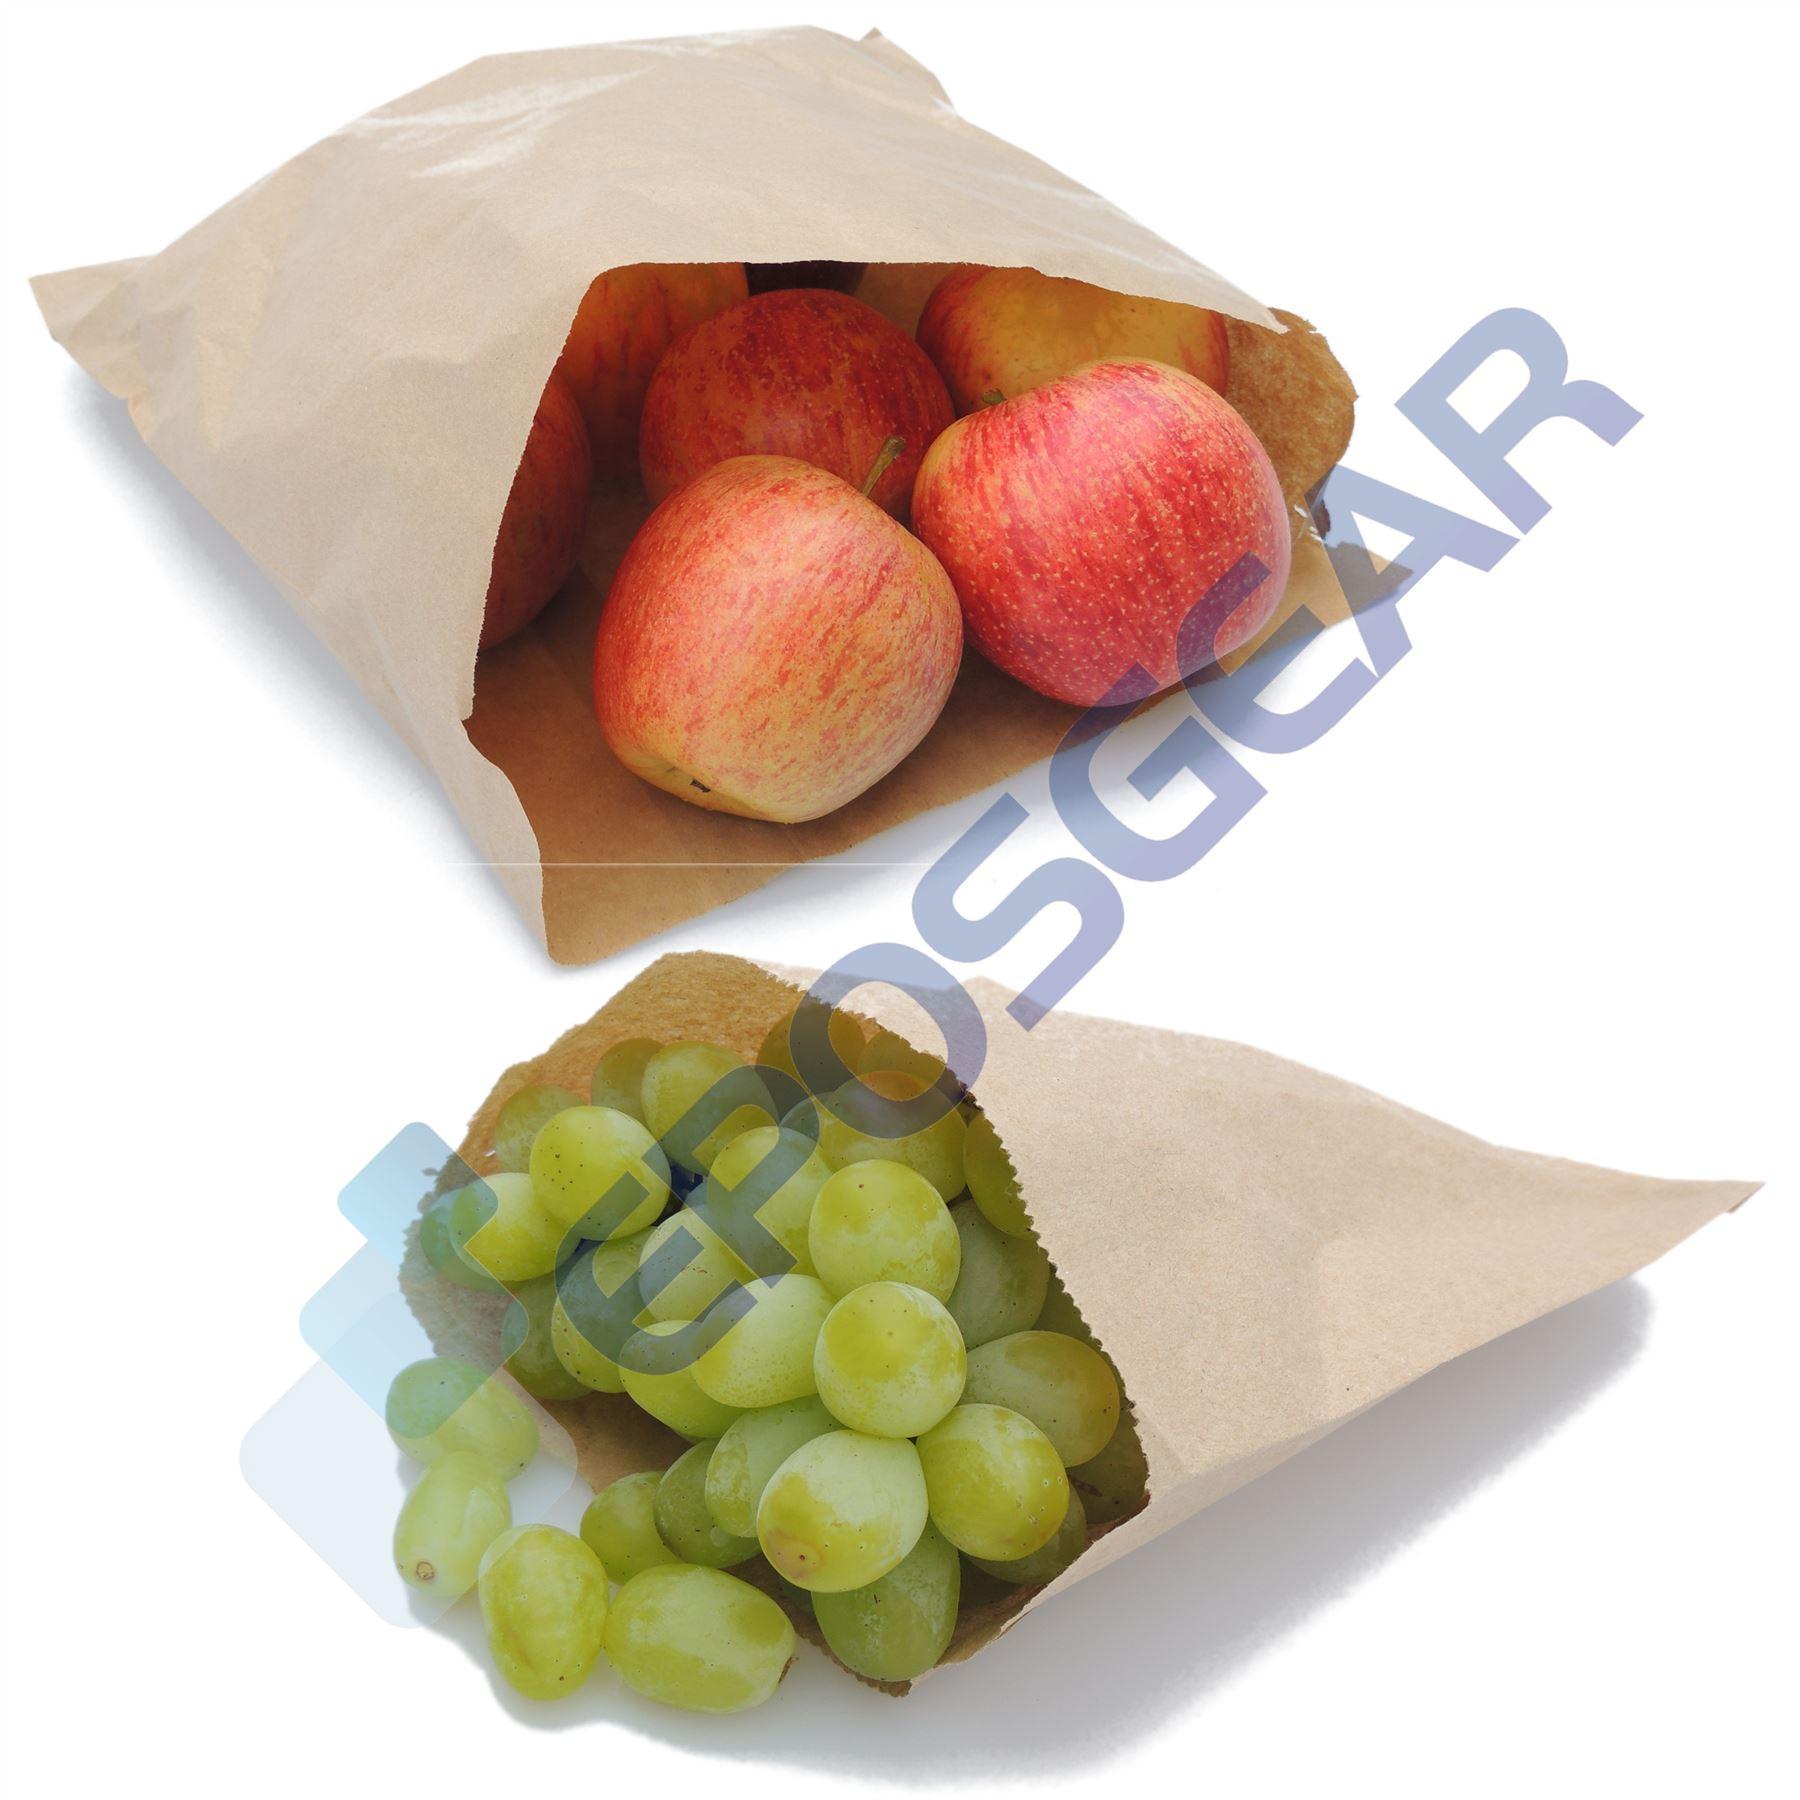 Brown Kraft White Sulphite Strung Sweet Food Fruit Veg Market Stall Paper Bags